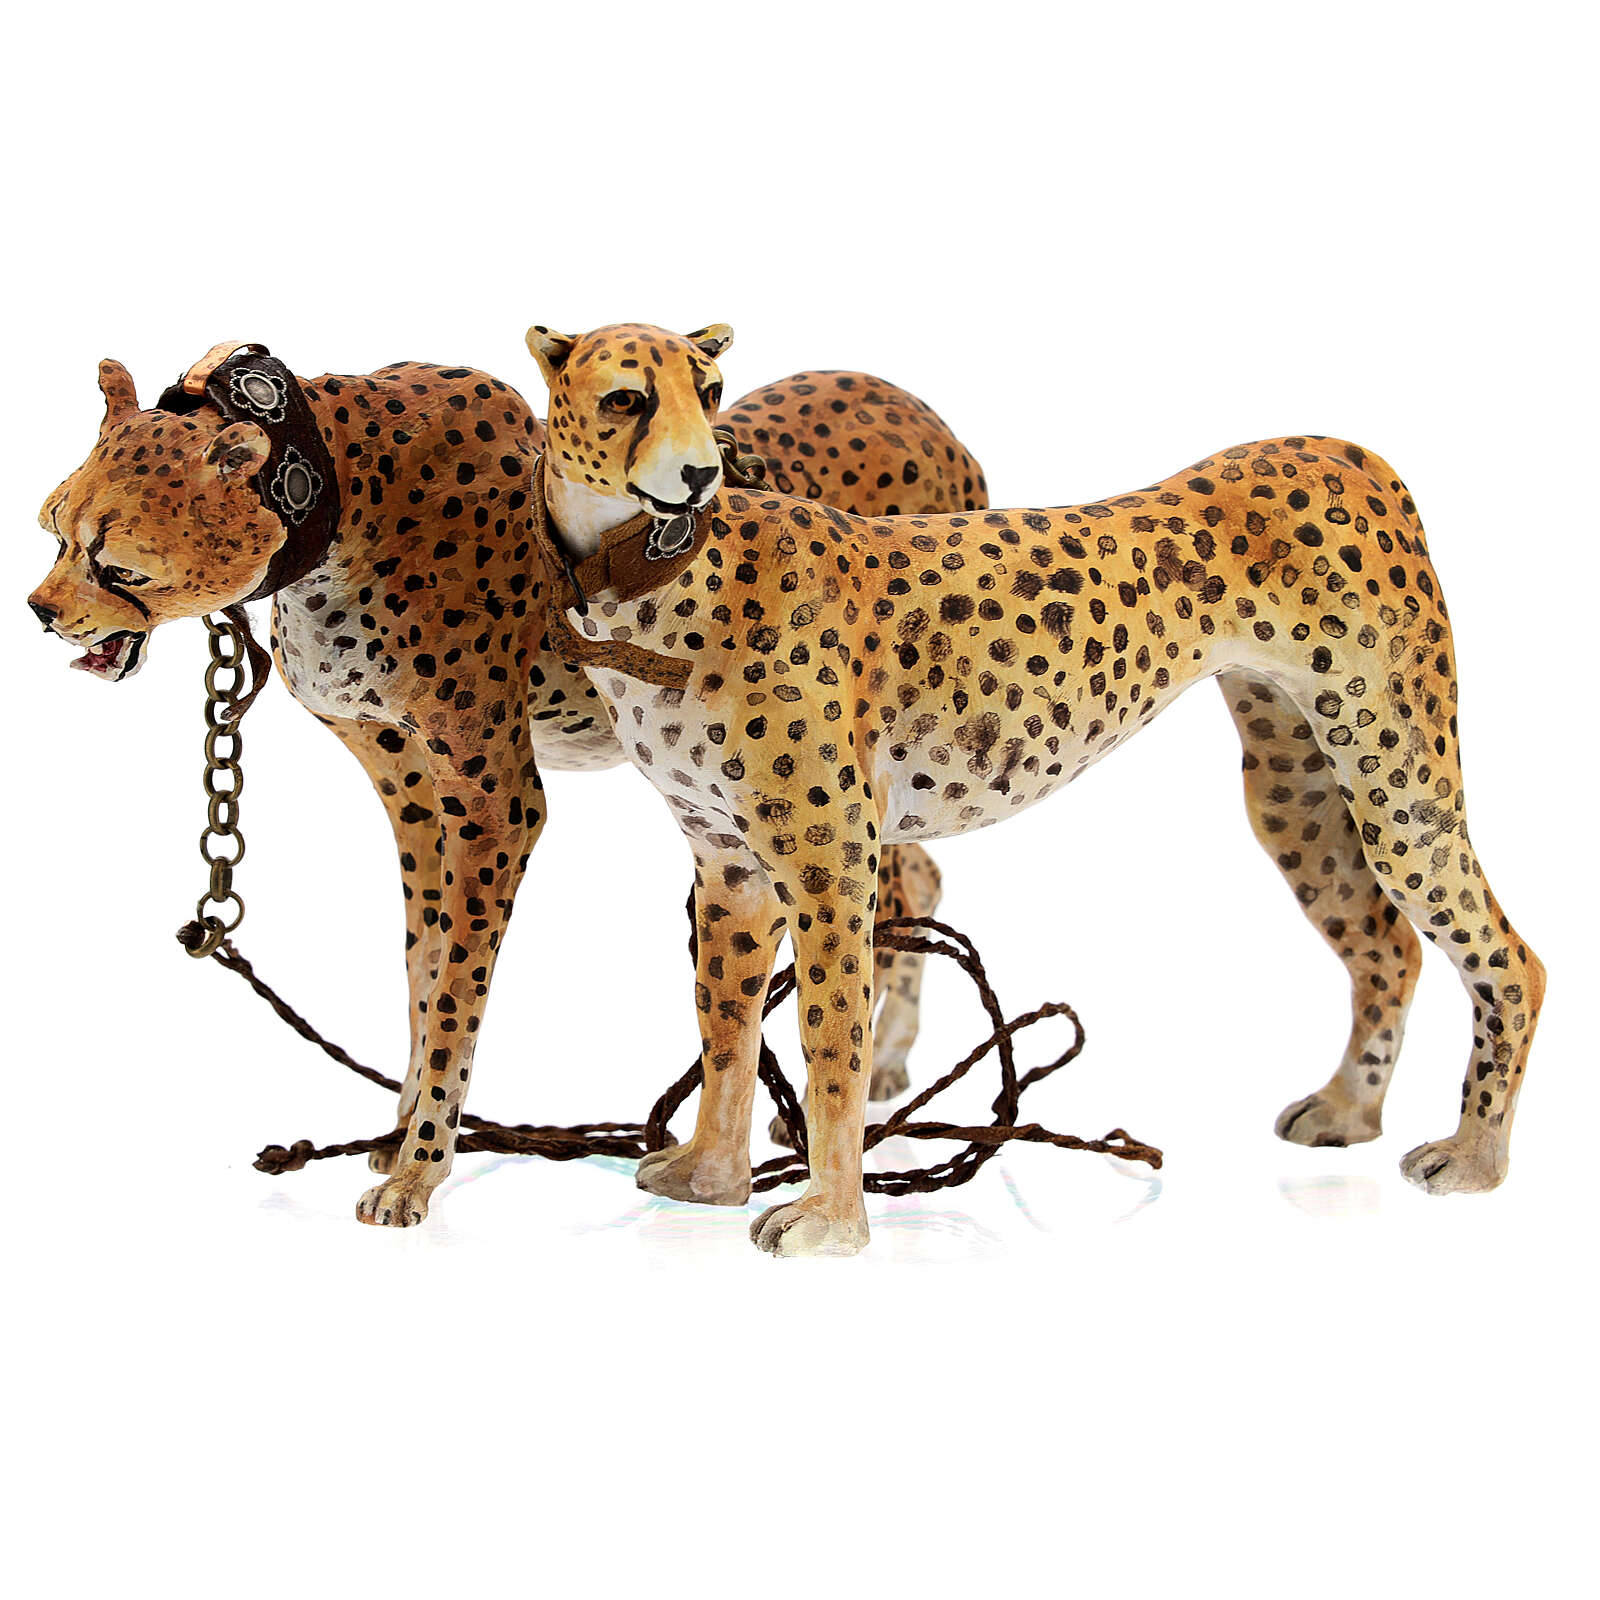 Schiavo con ghepardi 30 cm Angela Tripi 4